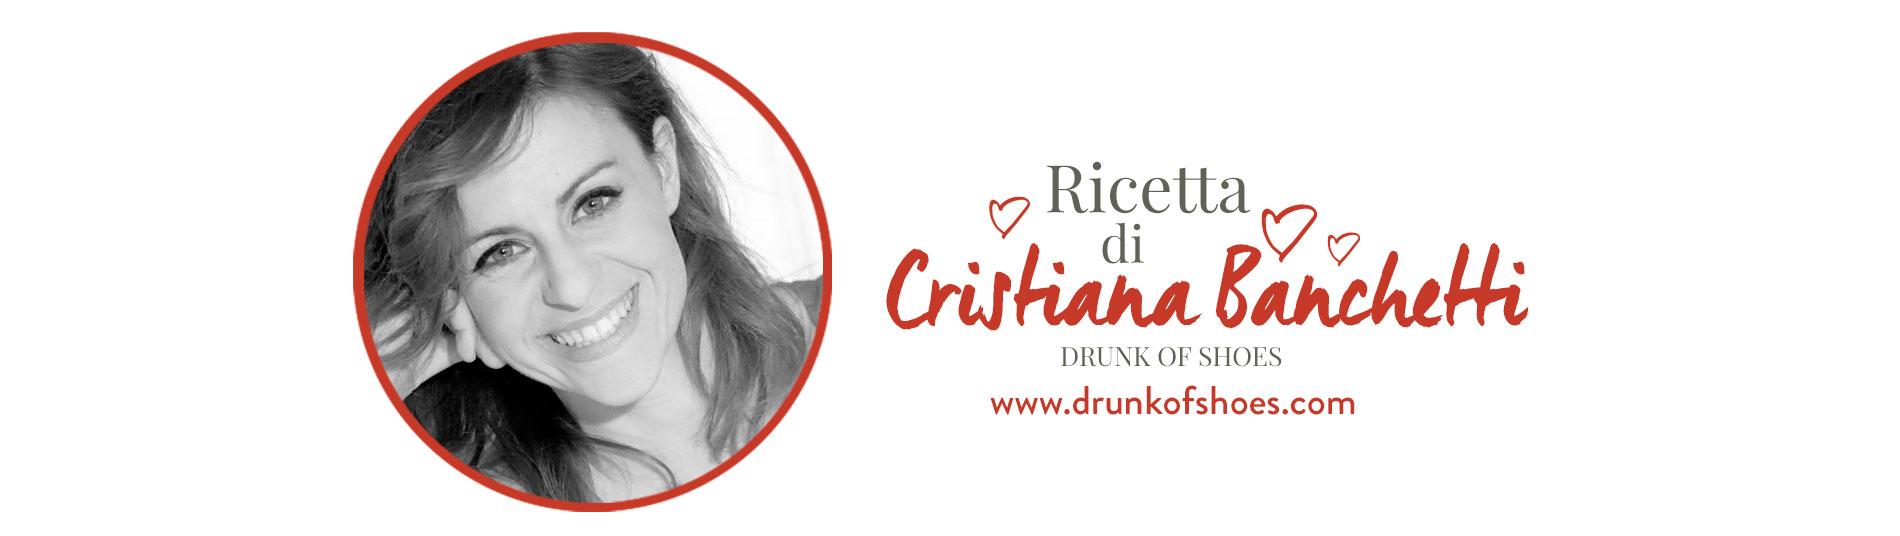 Cristiana Banchetti